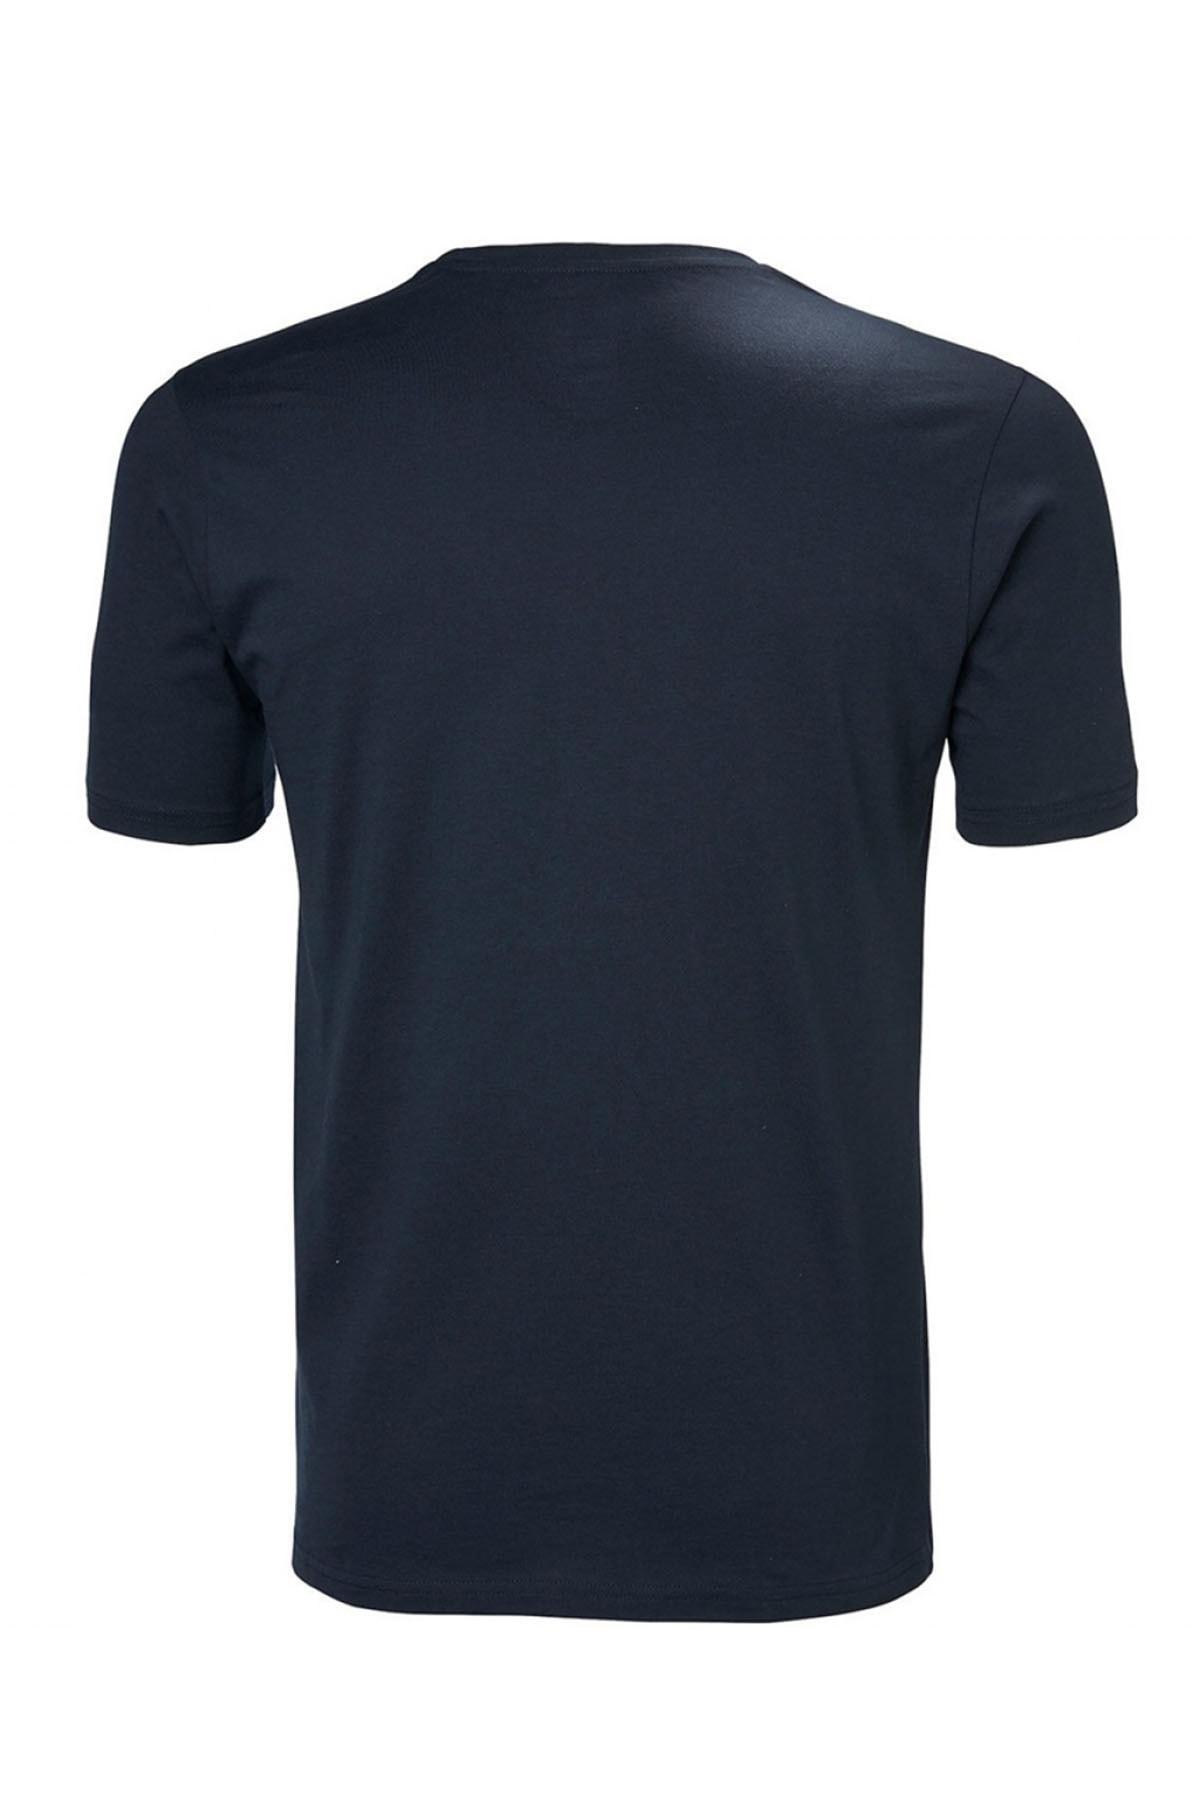 Helly Hansen Erkek Spor T-Shirt - 33979-597 2